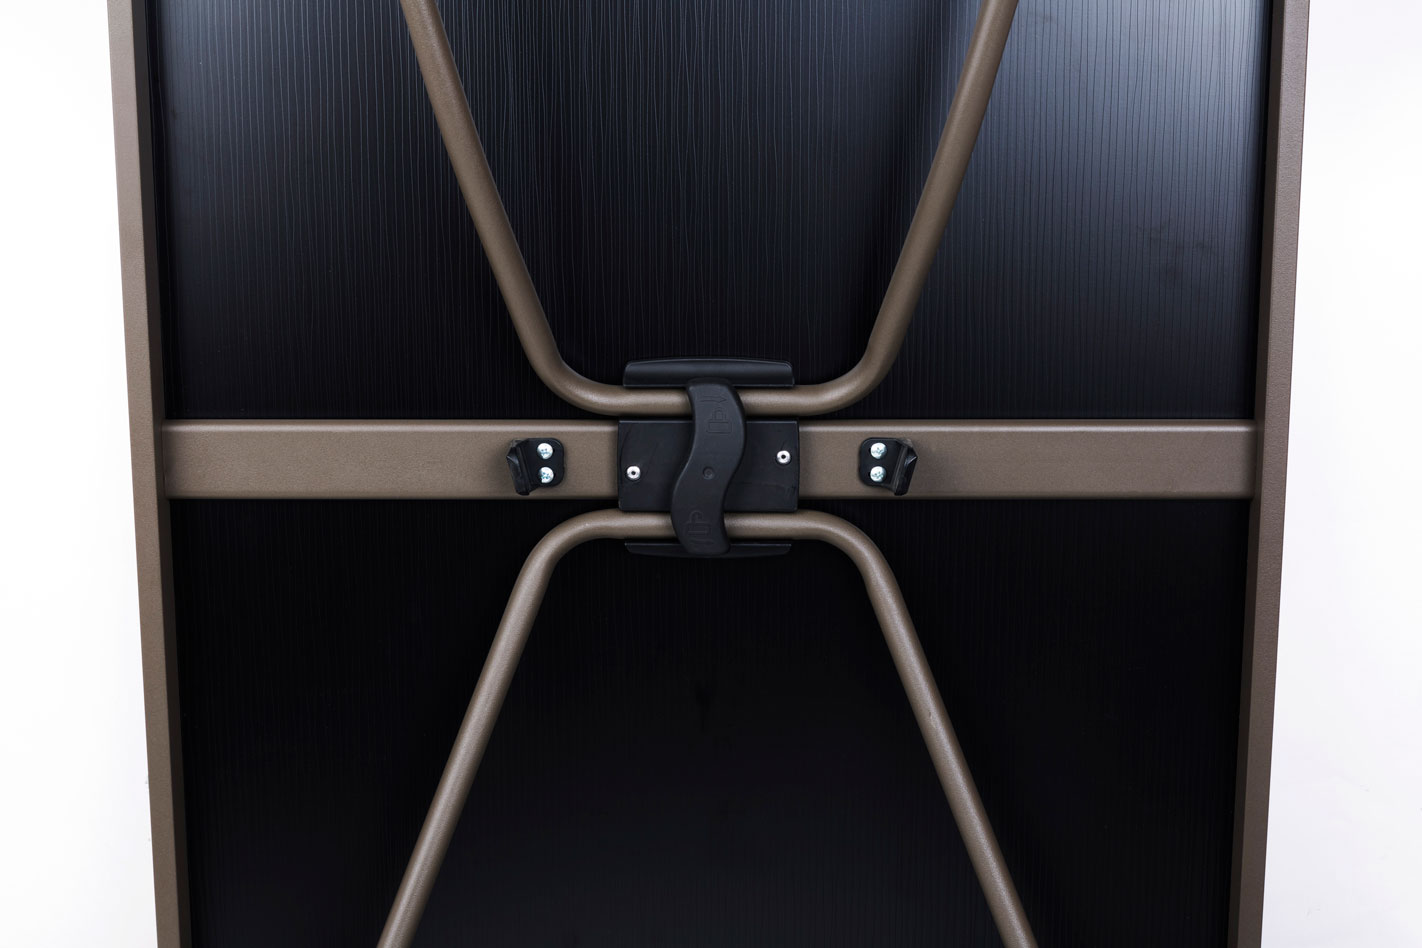 xxl-session-table_main_locked-legsgif